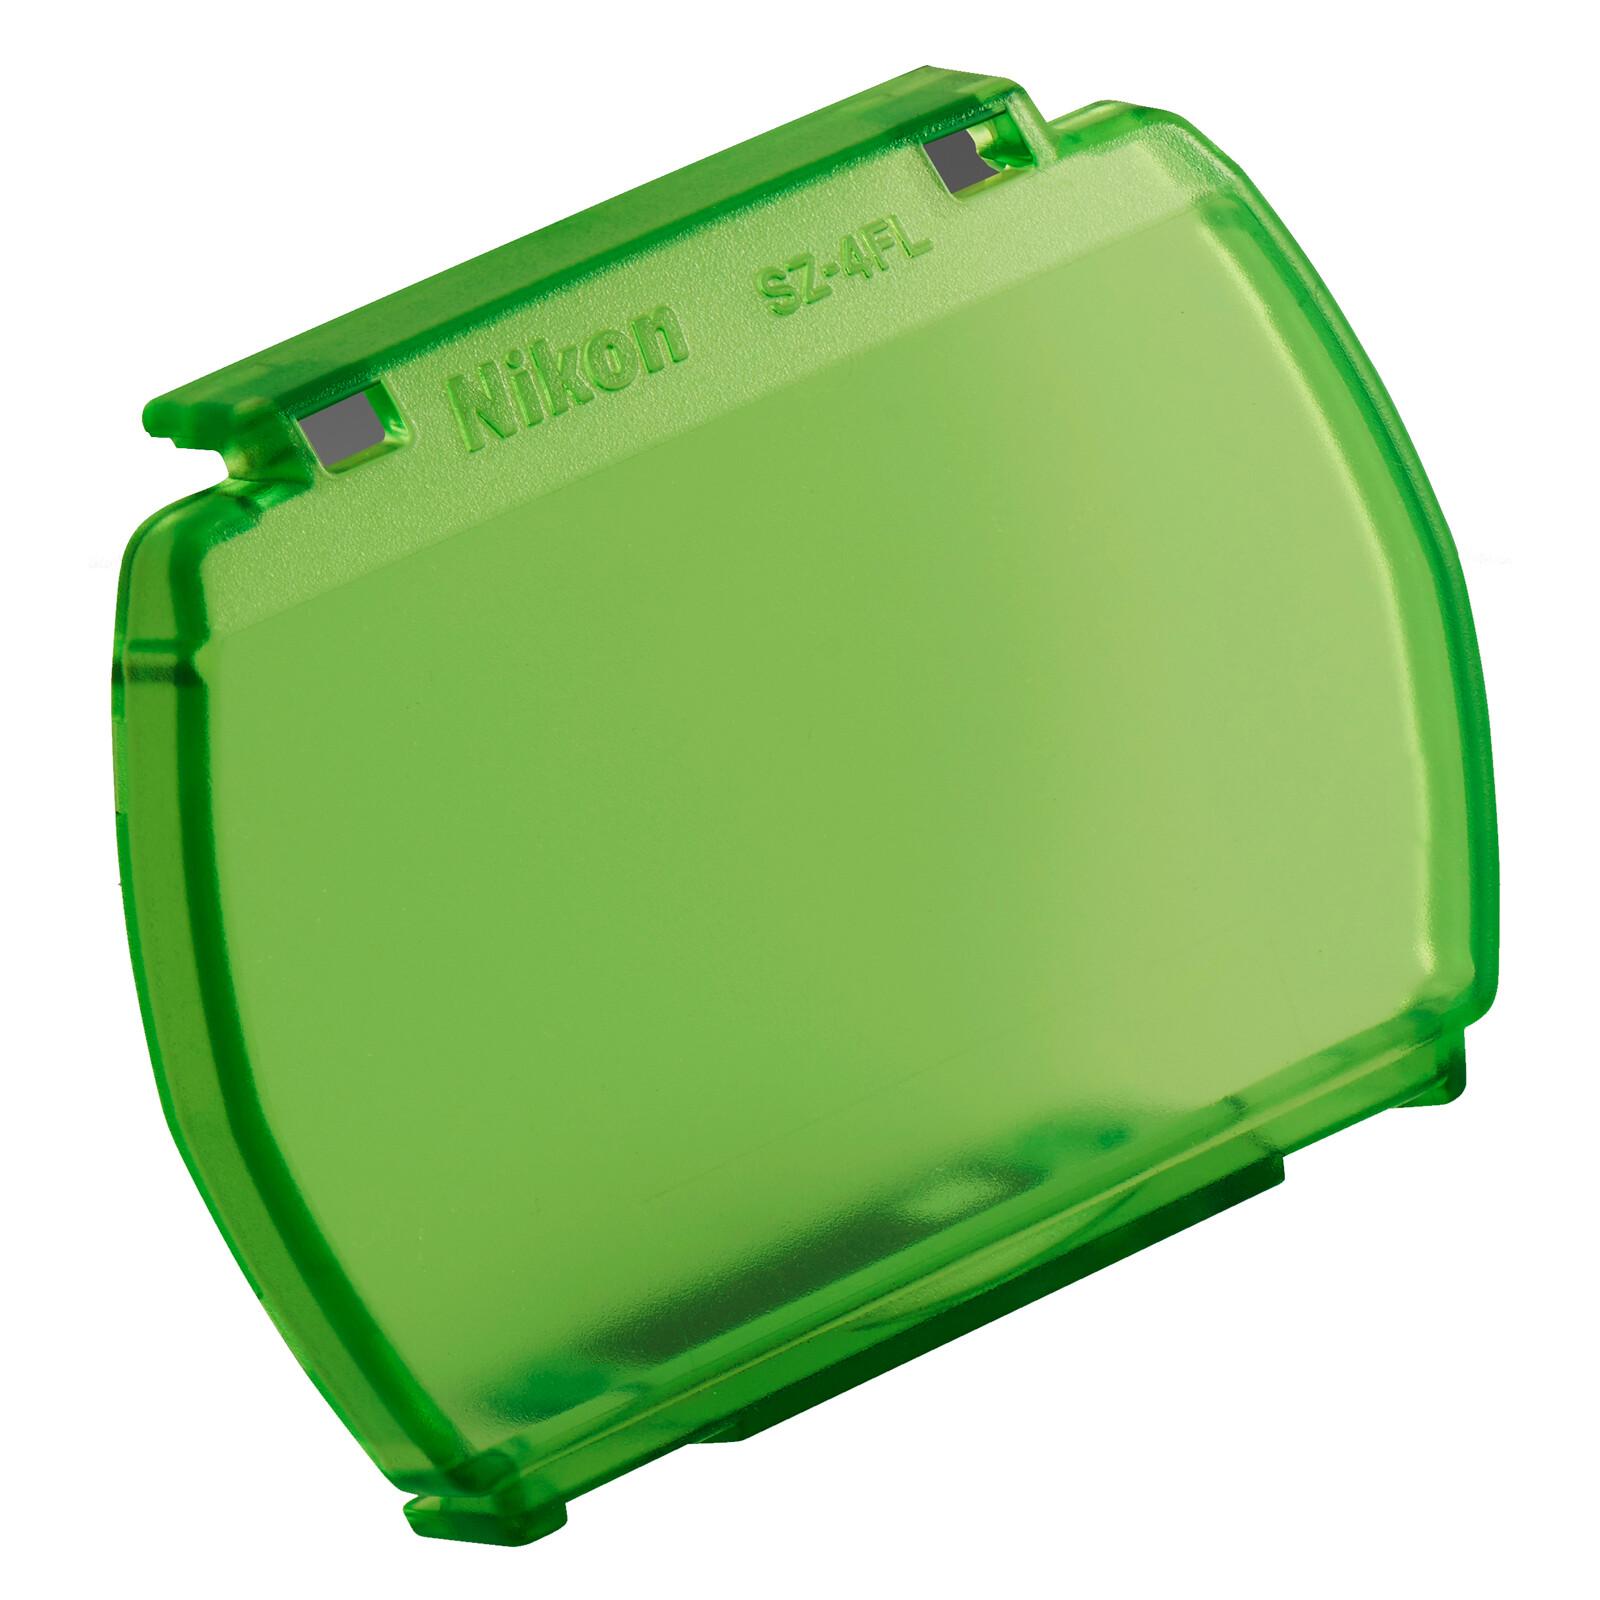 Nikon SZ-4FL Leuchtstofflampenfilter